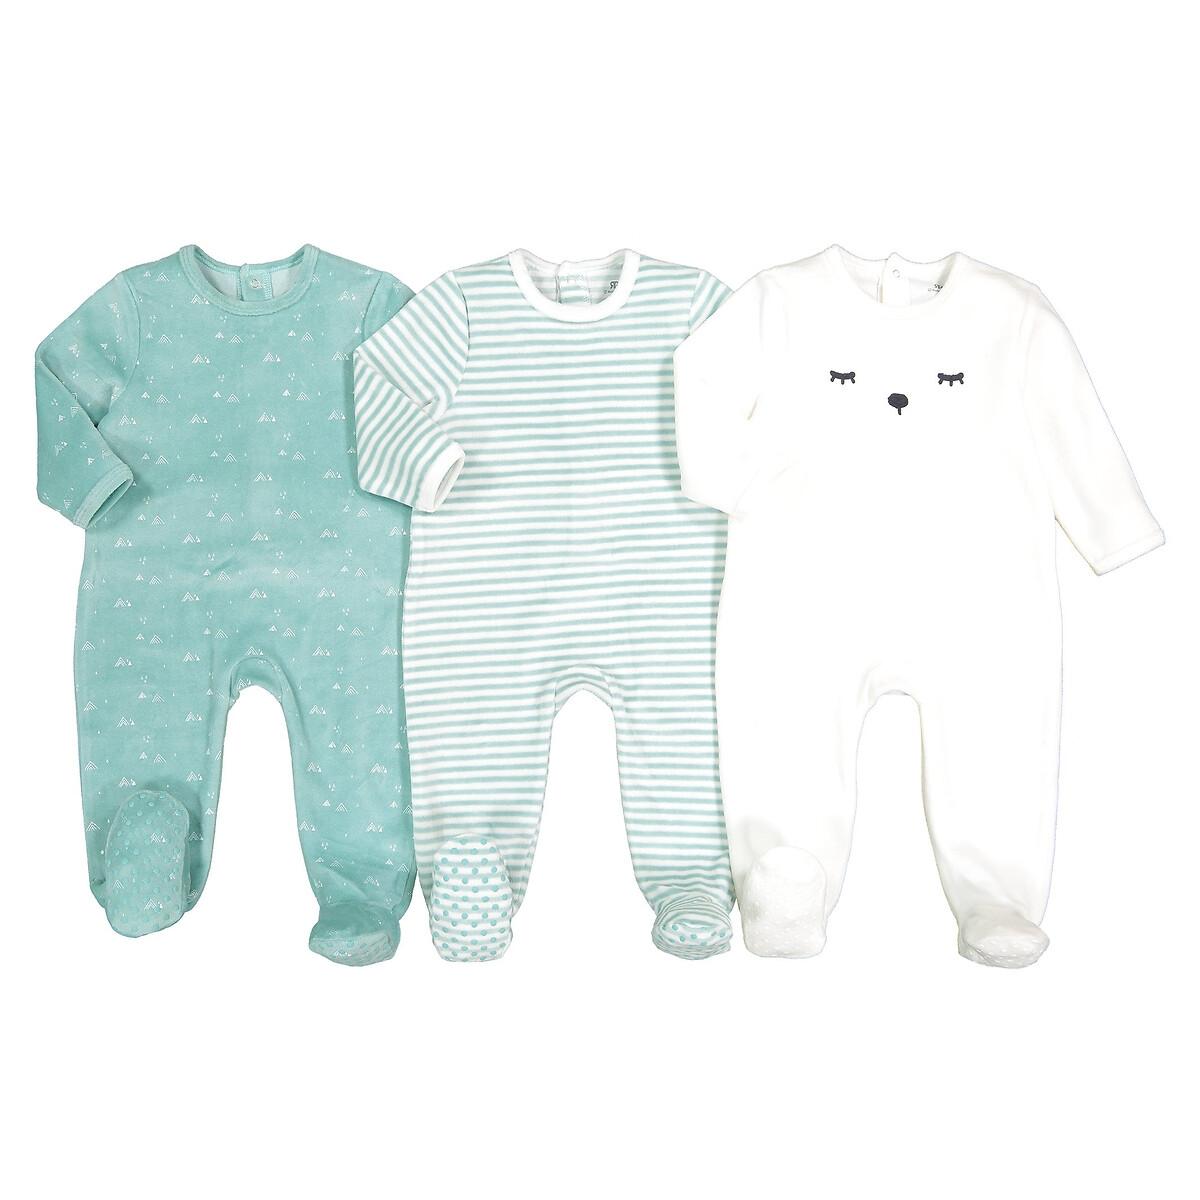 Комплект из 3 пижам из LaRedoute Велюра 0 мес - 3 года 3 года - 94 см синий пижама laredoute с носочками из велюра 0 мес 3 года 3 мес 60 см серый